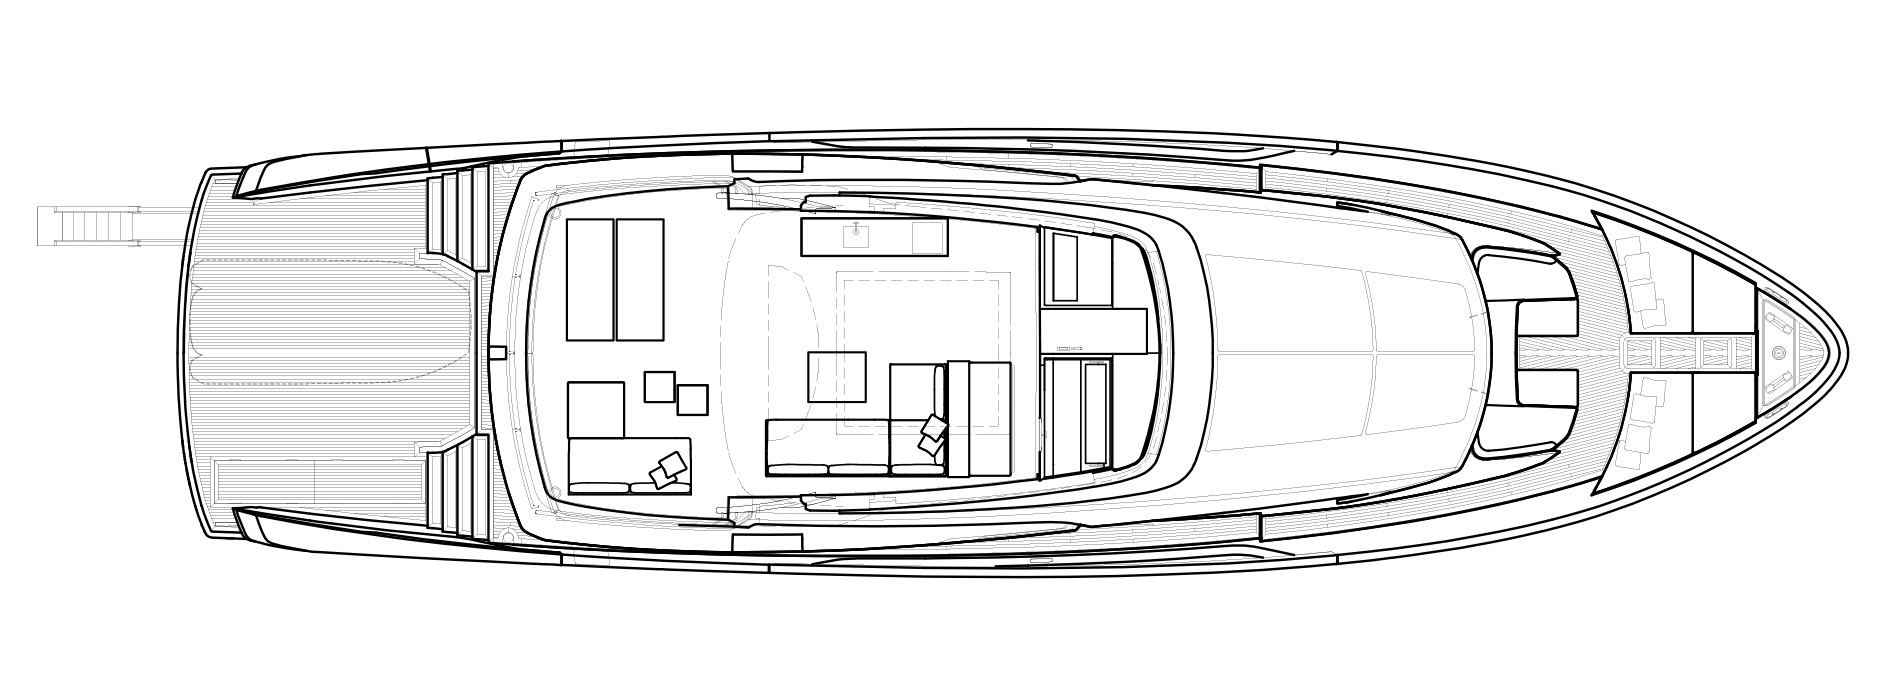 Sanlorenzo Yachts SX88 Flying bridge Versione A